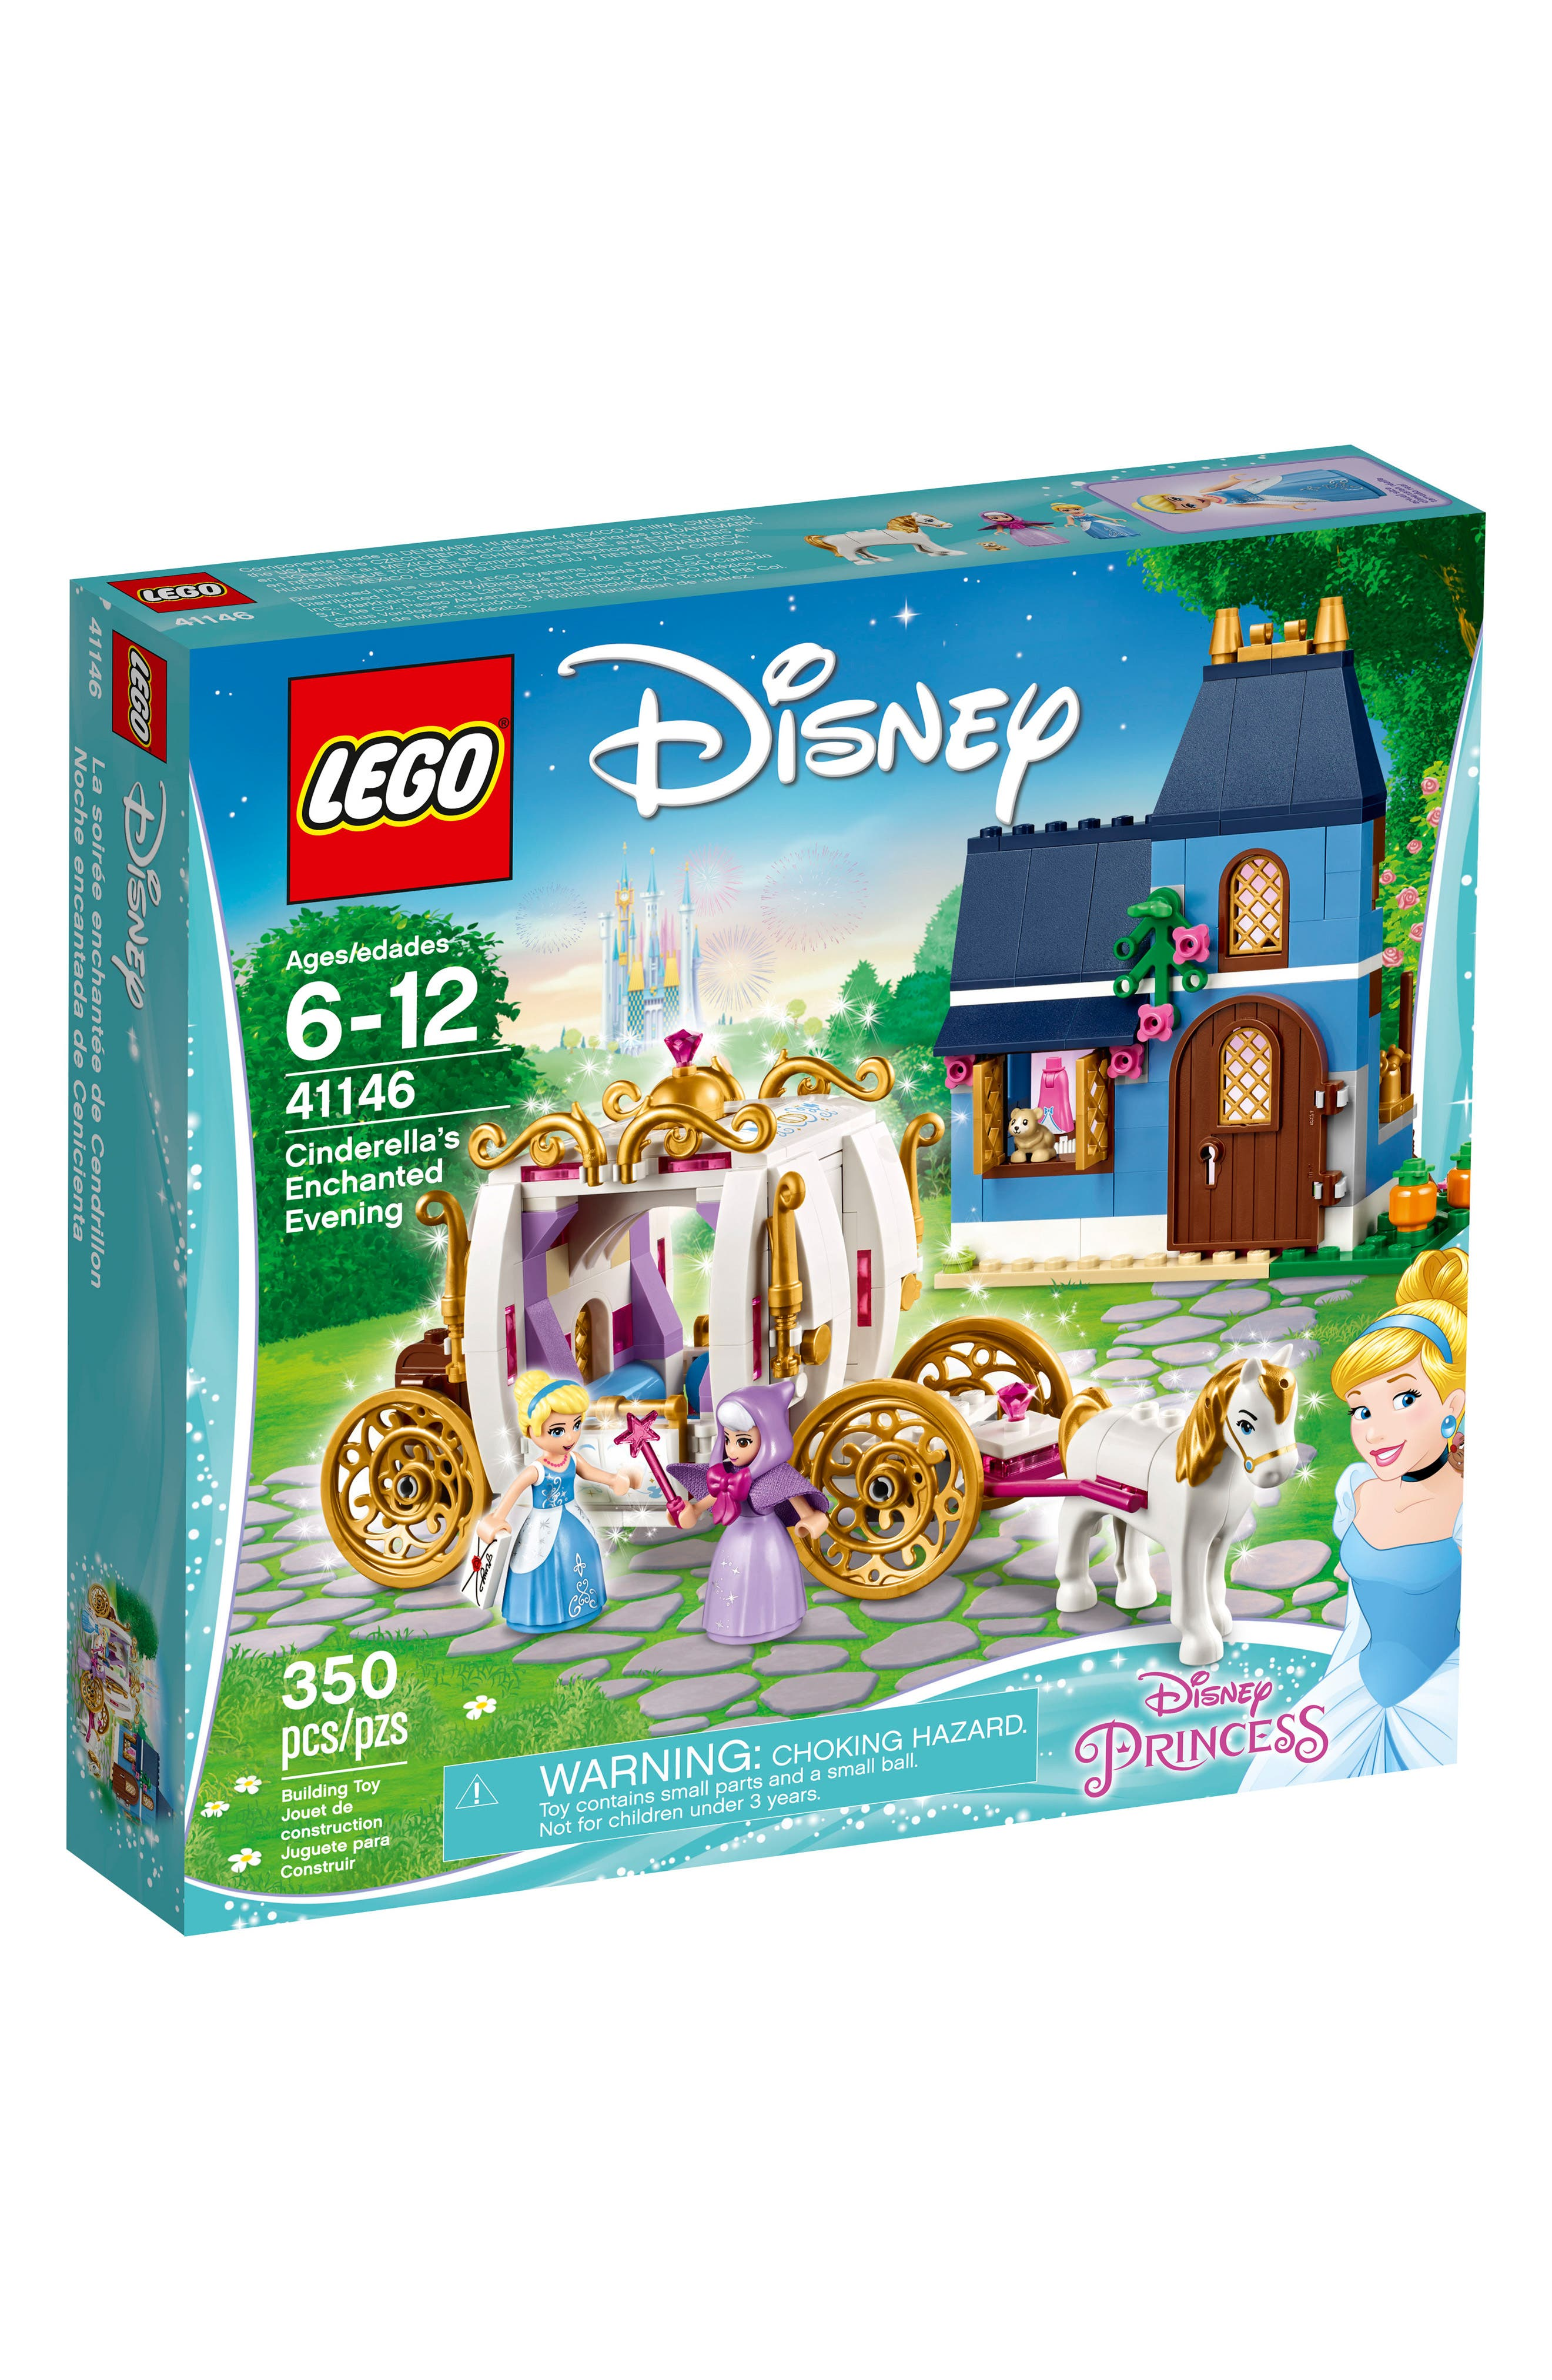 LEGO® Disney™ Cinderella's Enchanted Evening Play Set - 41146